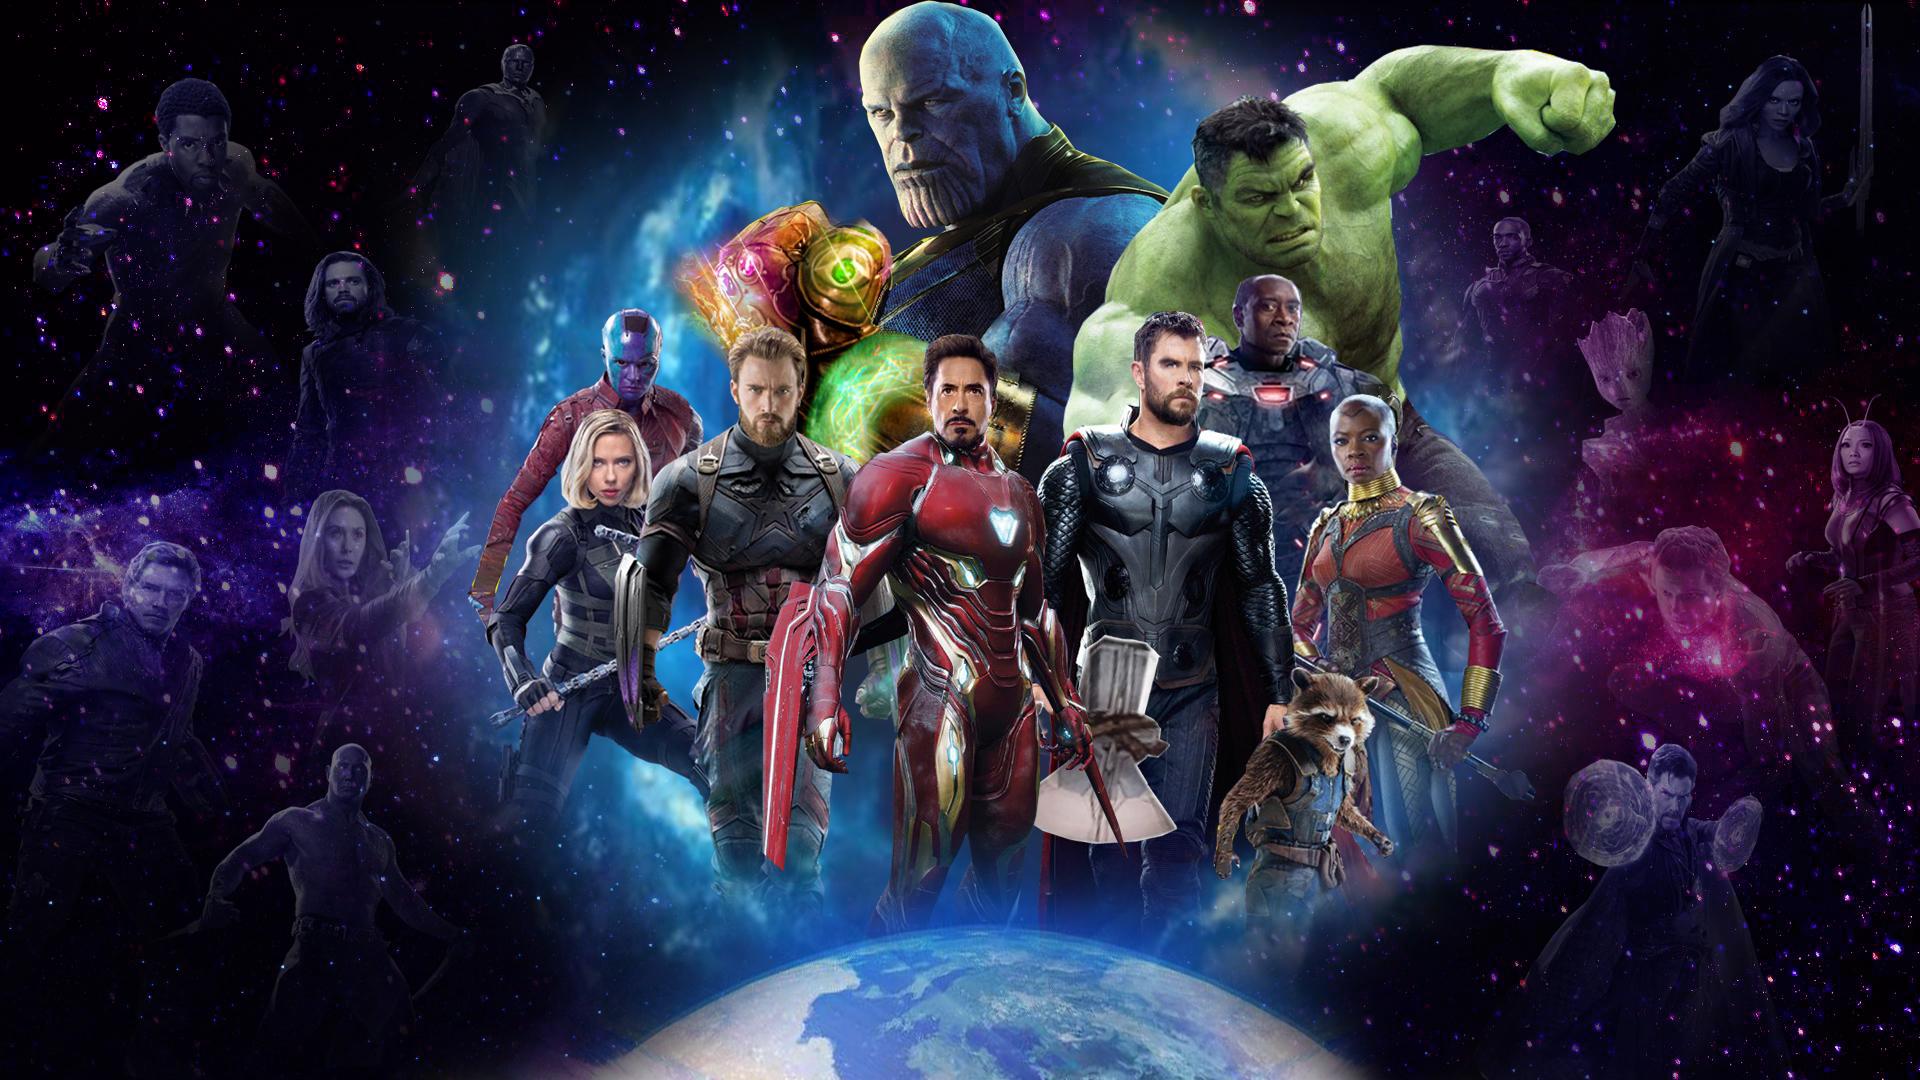 Download Galaxy Note 5 Galaxy S6 Edge Full Hd Stock: Avengers 4 Artwork From Infinity War, Full HD Wallpaper